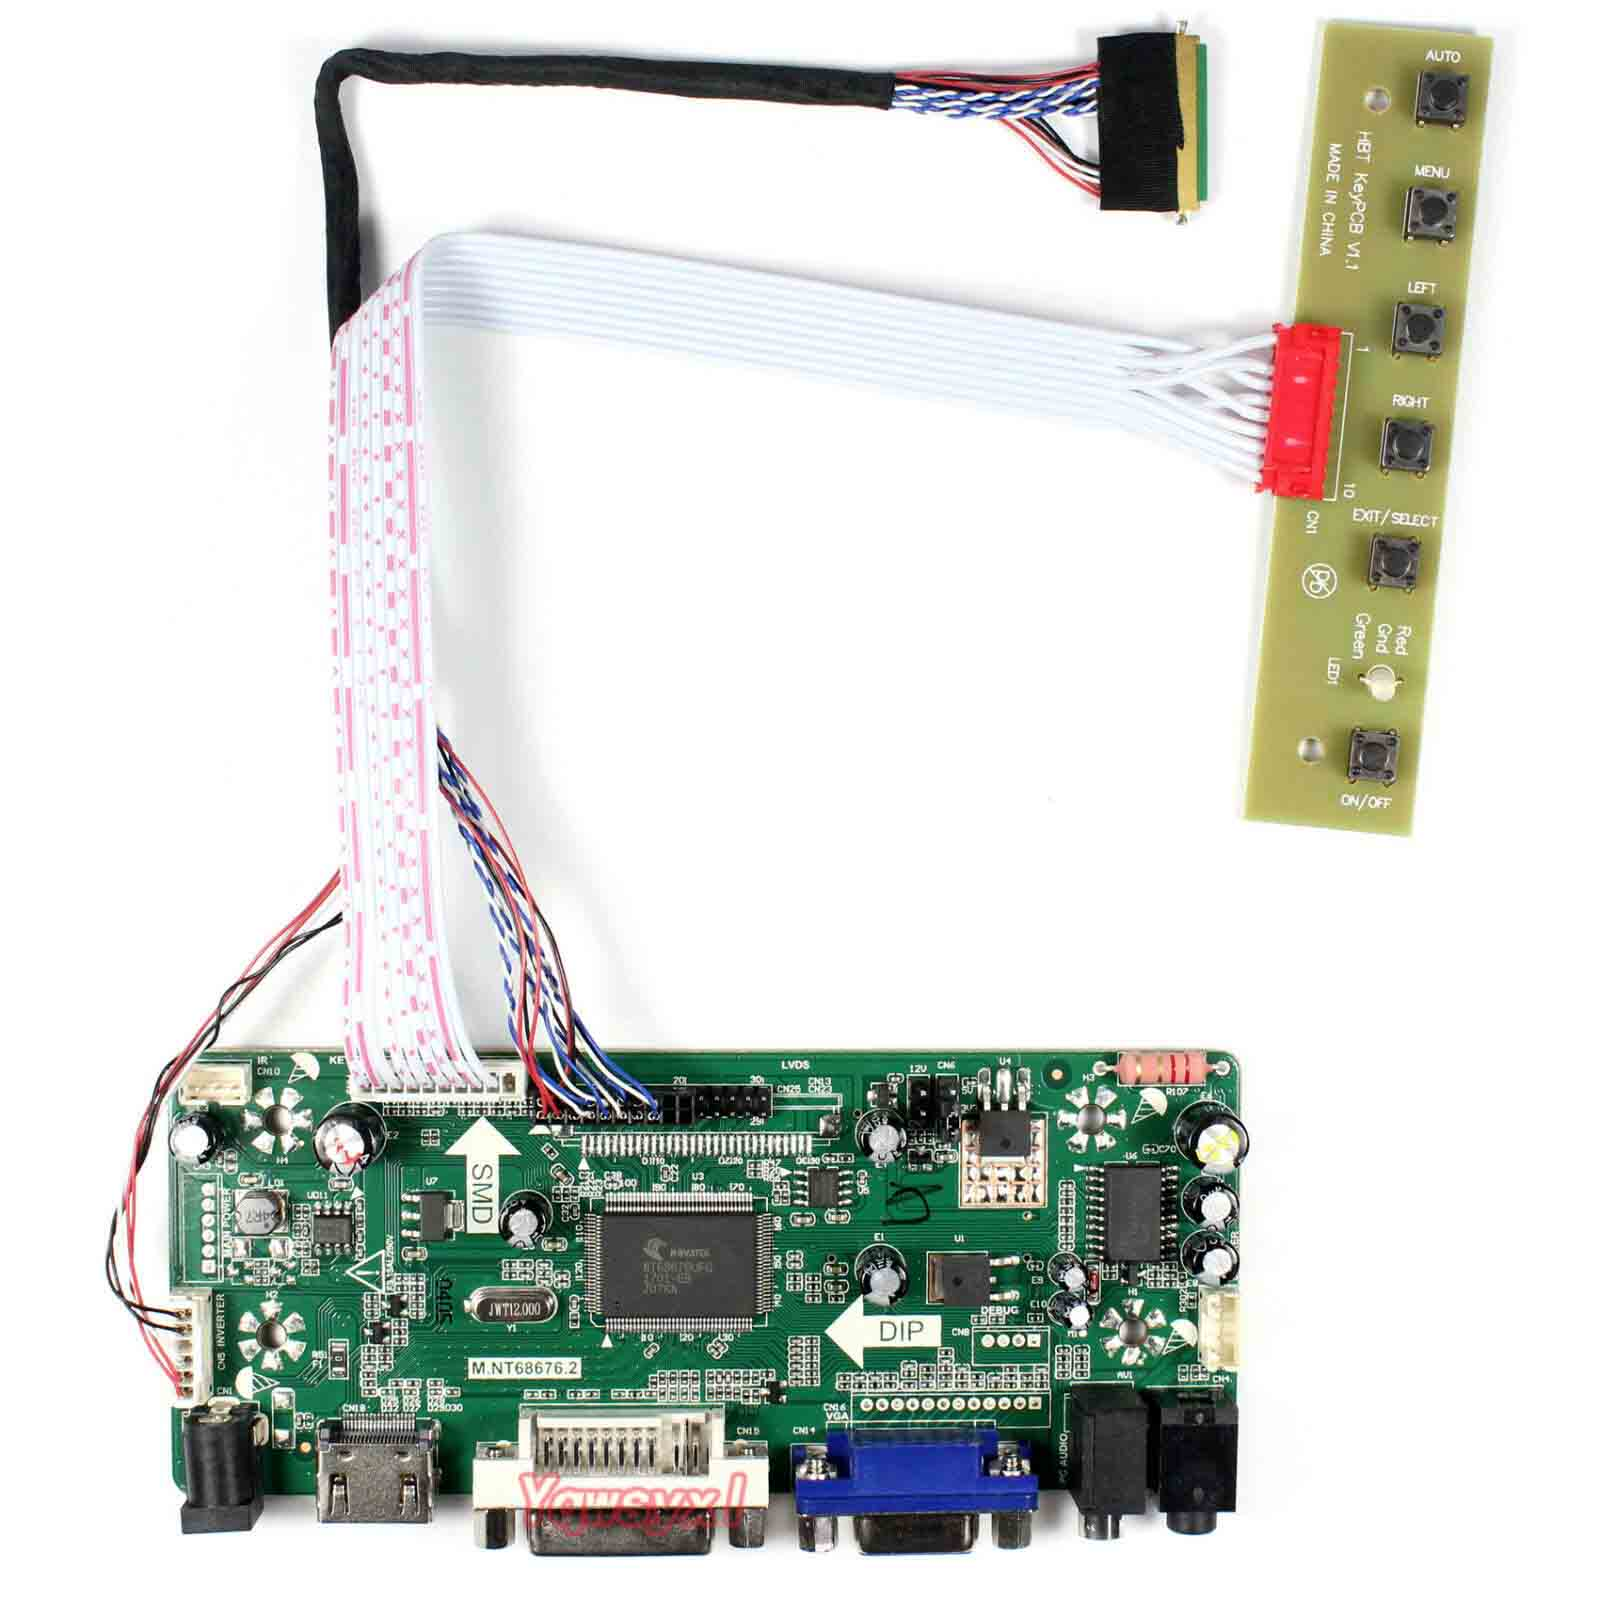 Yqwsyxl Control Board Monitor Kit For N156B6-L0B  HDMI + DVI + VGA LCD LED  Screen  Controller  Board Driver